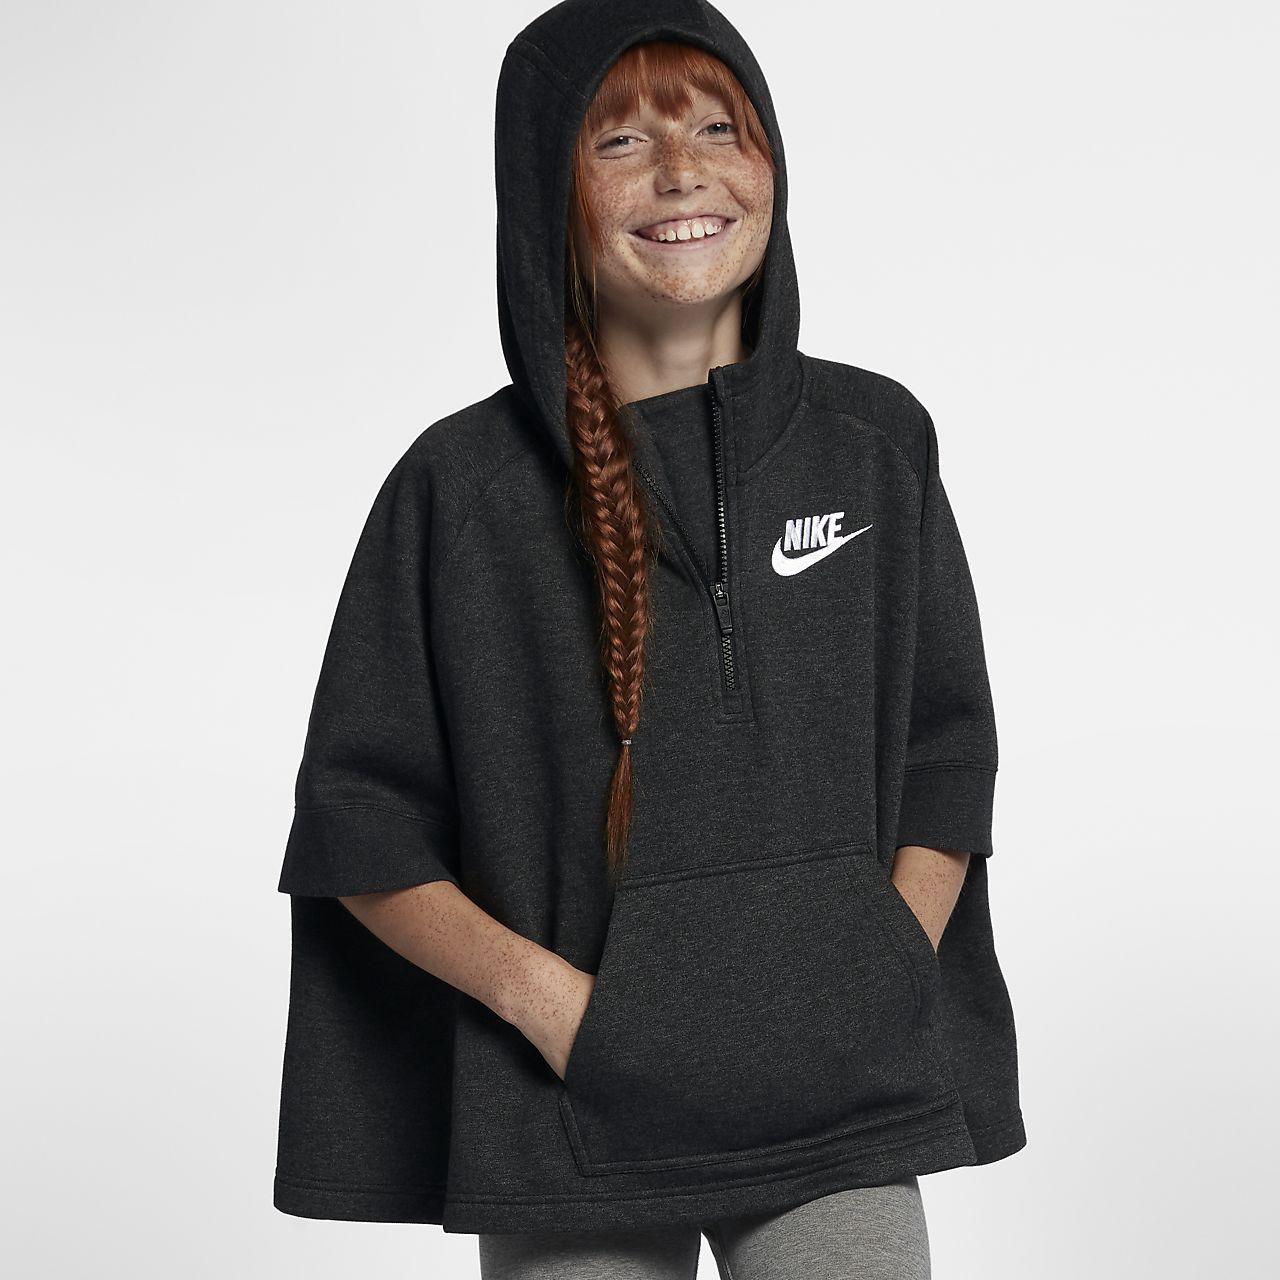 f78c4a7a09be Nike Sportswear Big Kids  (Girls ) Pullover Half-Zip Poncho - M (10 ...